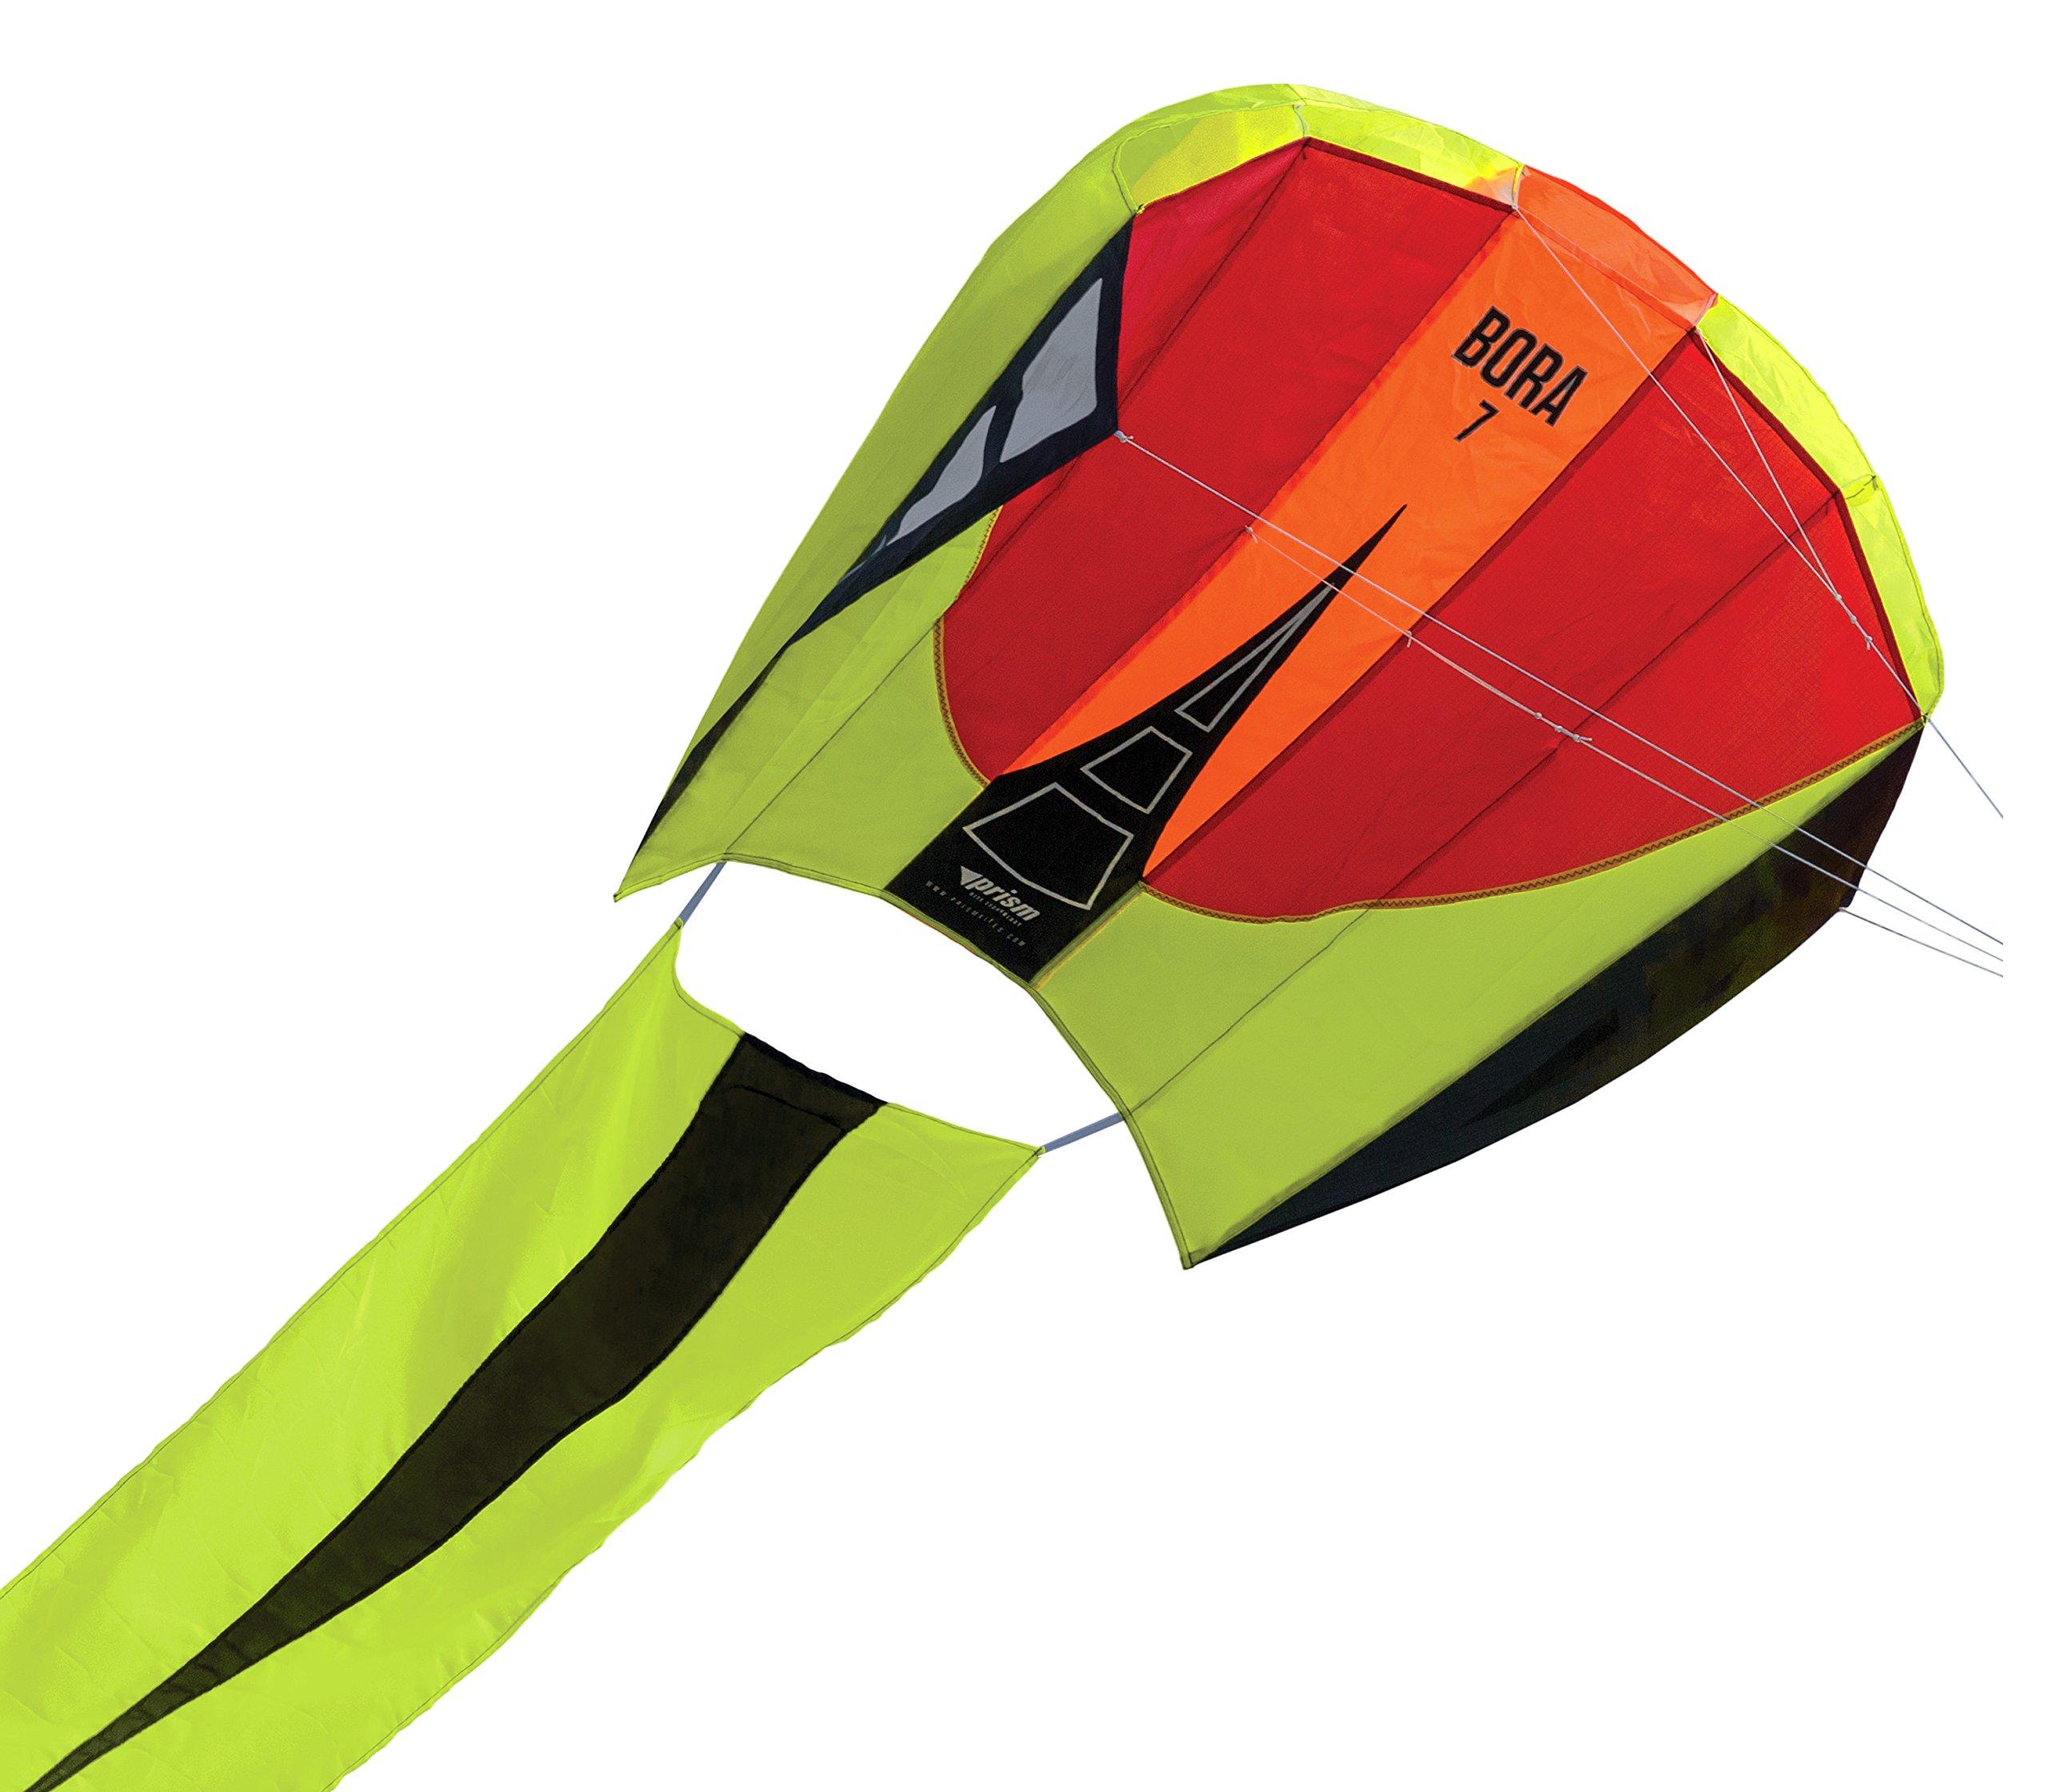 Prism Bora 7 Single-line Parafoil Kite, Blaze by Prism Kite Technology